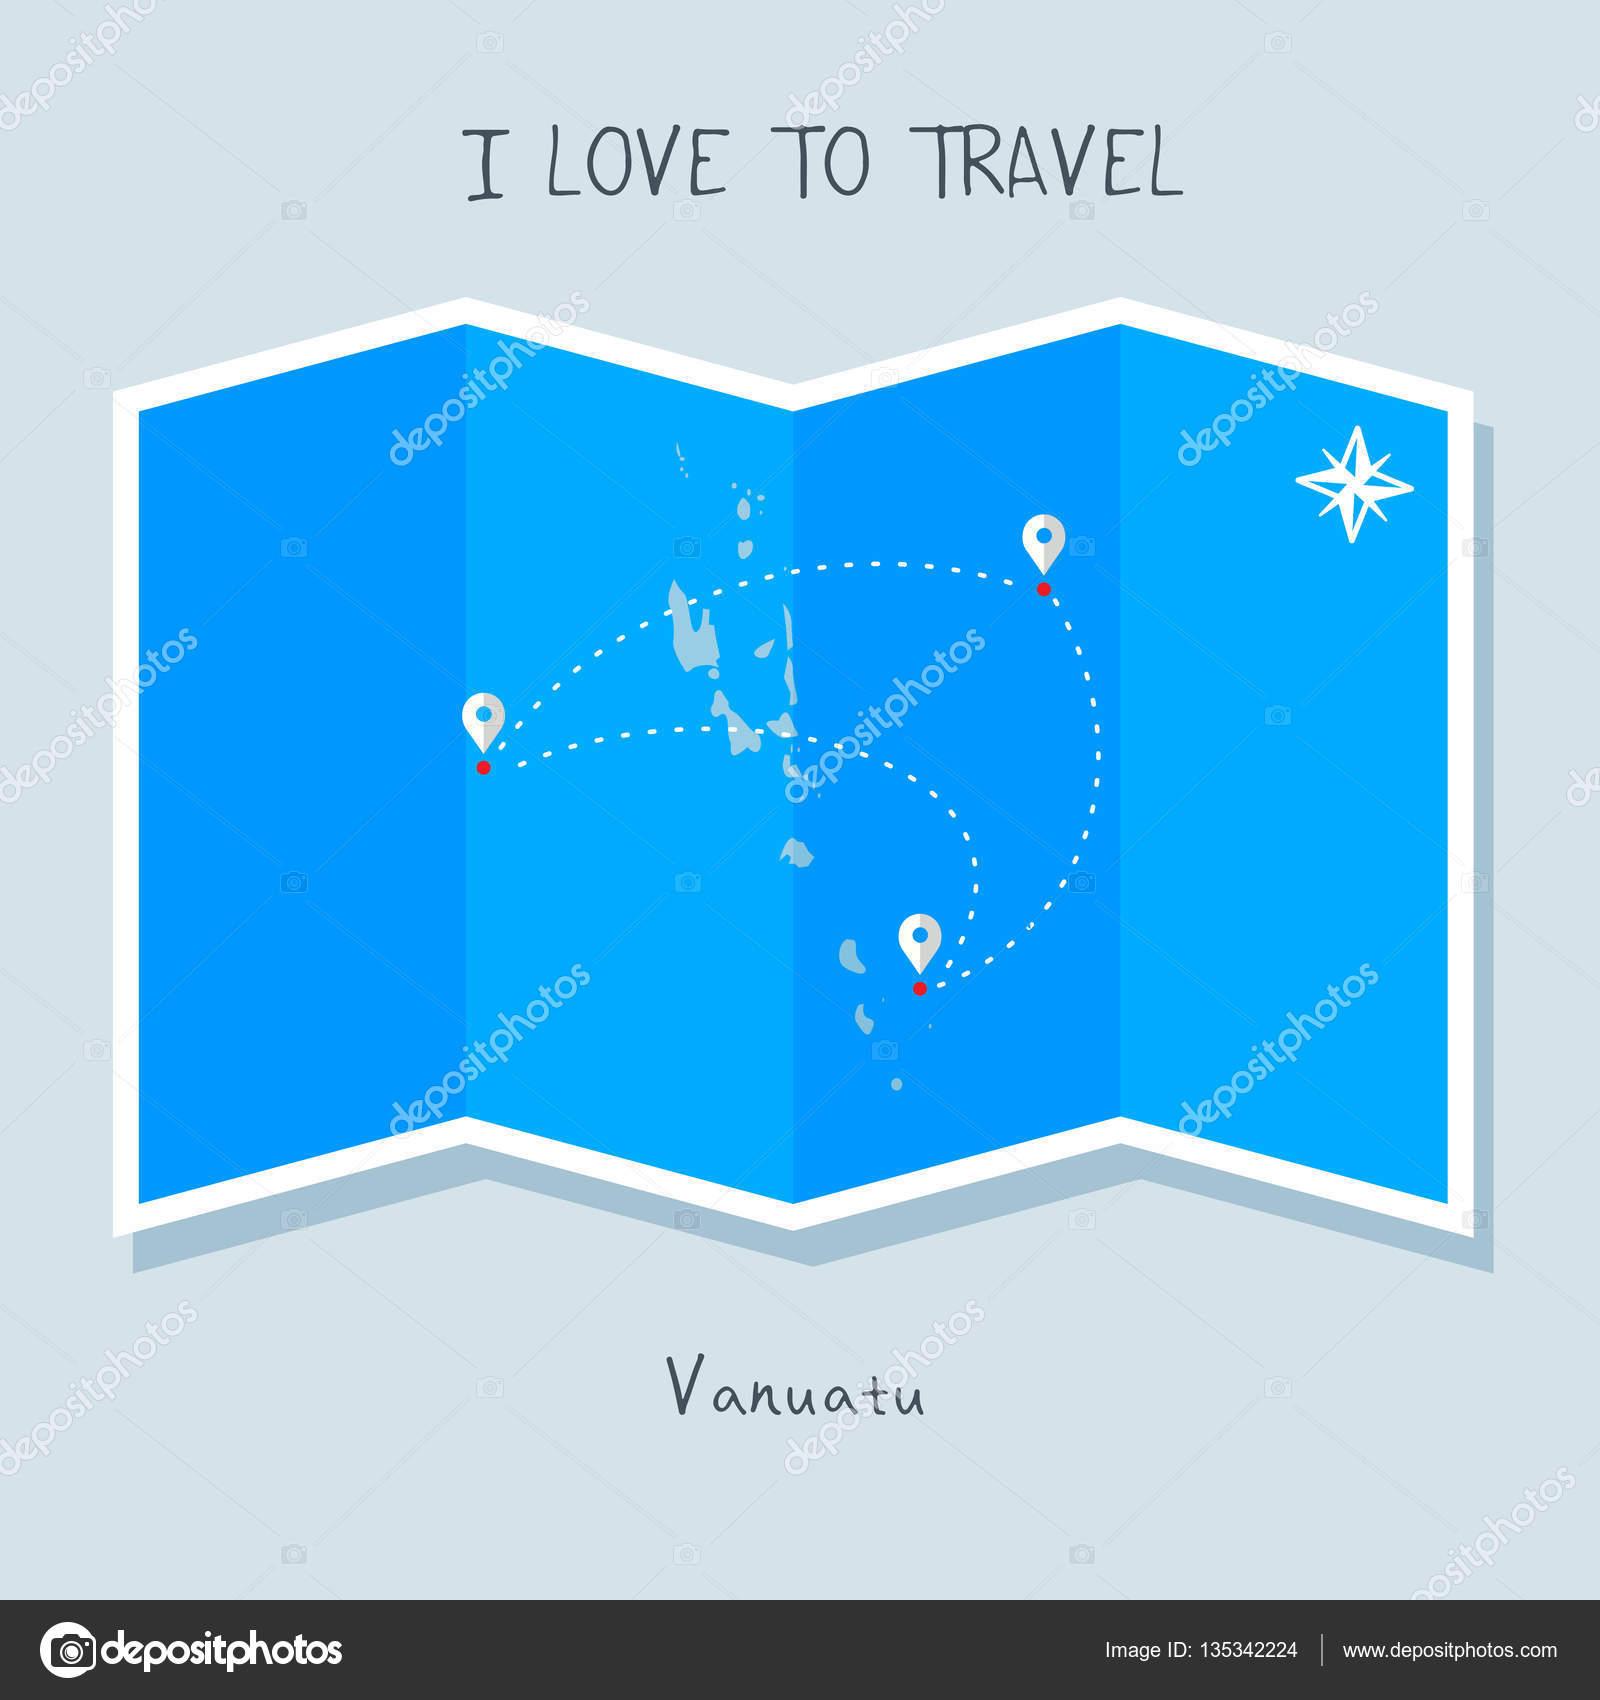 Where Is Vanuatu Located On A World Map.Vanuatu On Blue World Map Stock Vector C Ibrandify 135342224